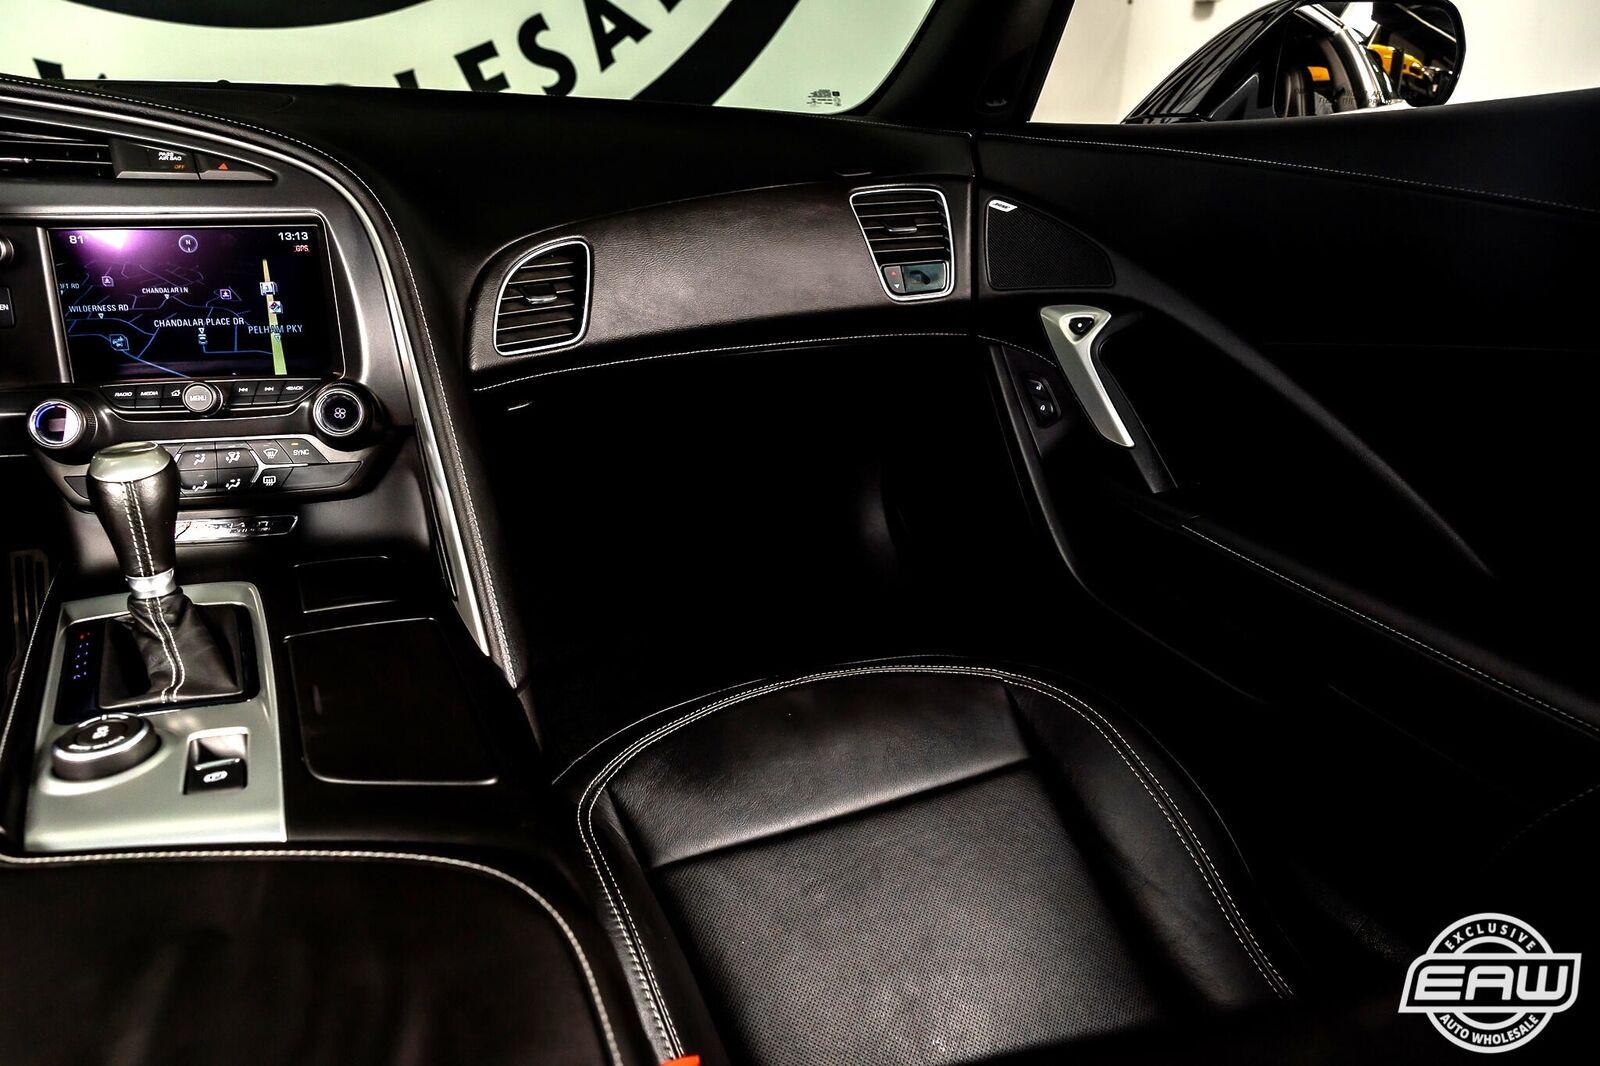 2014 White Chevrolet Corvette Coupe 1LT   C7 Corvette Photo 8